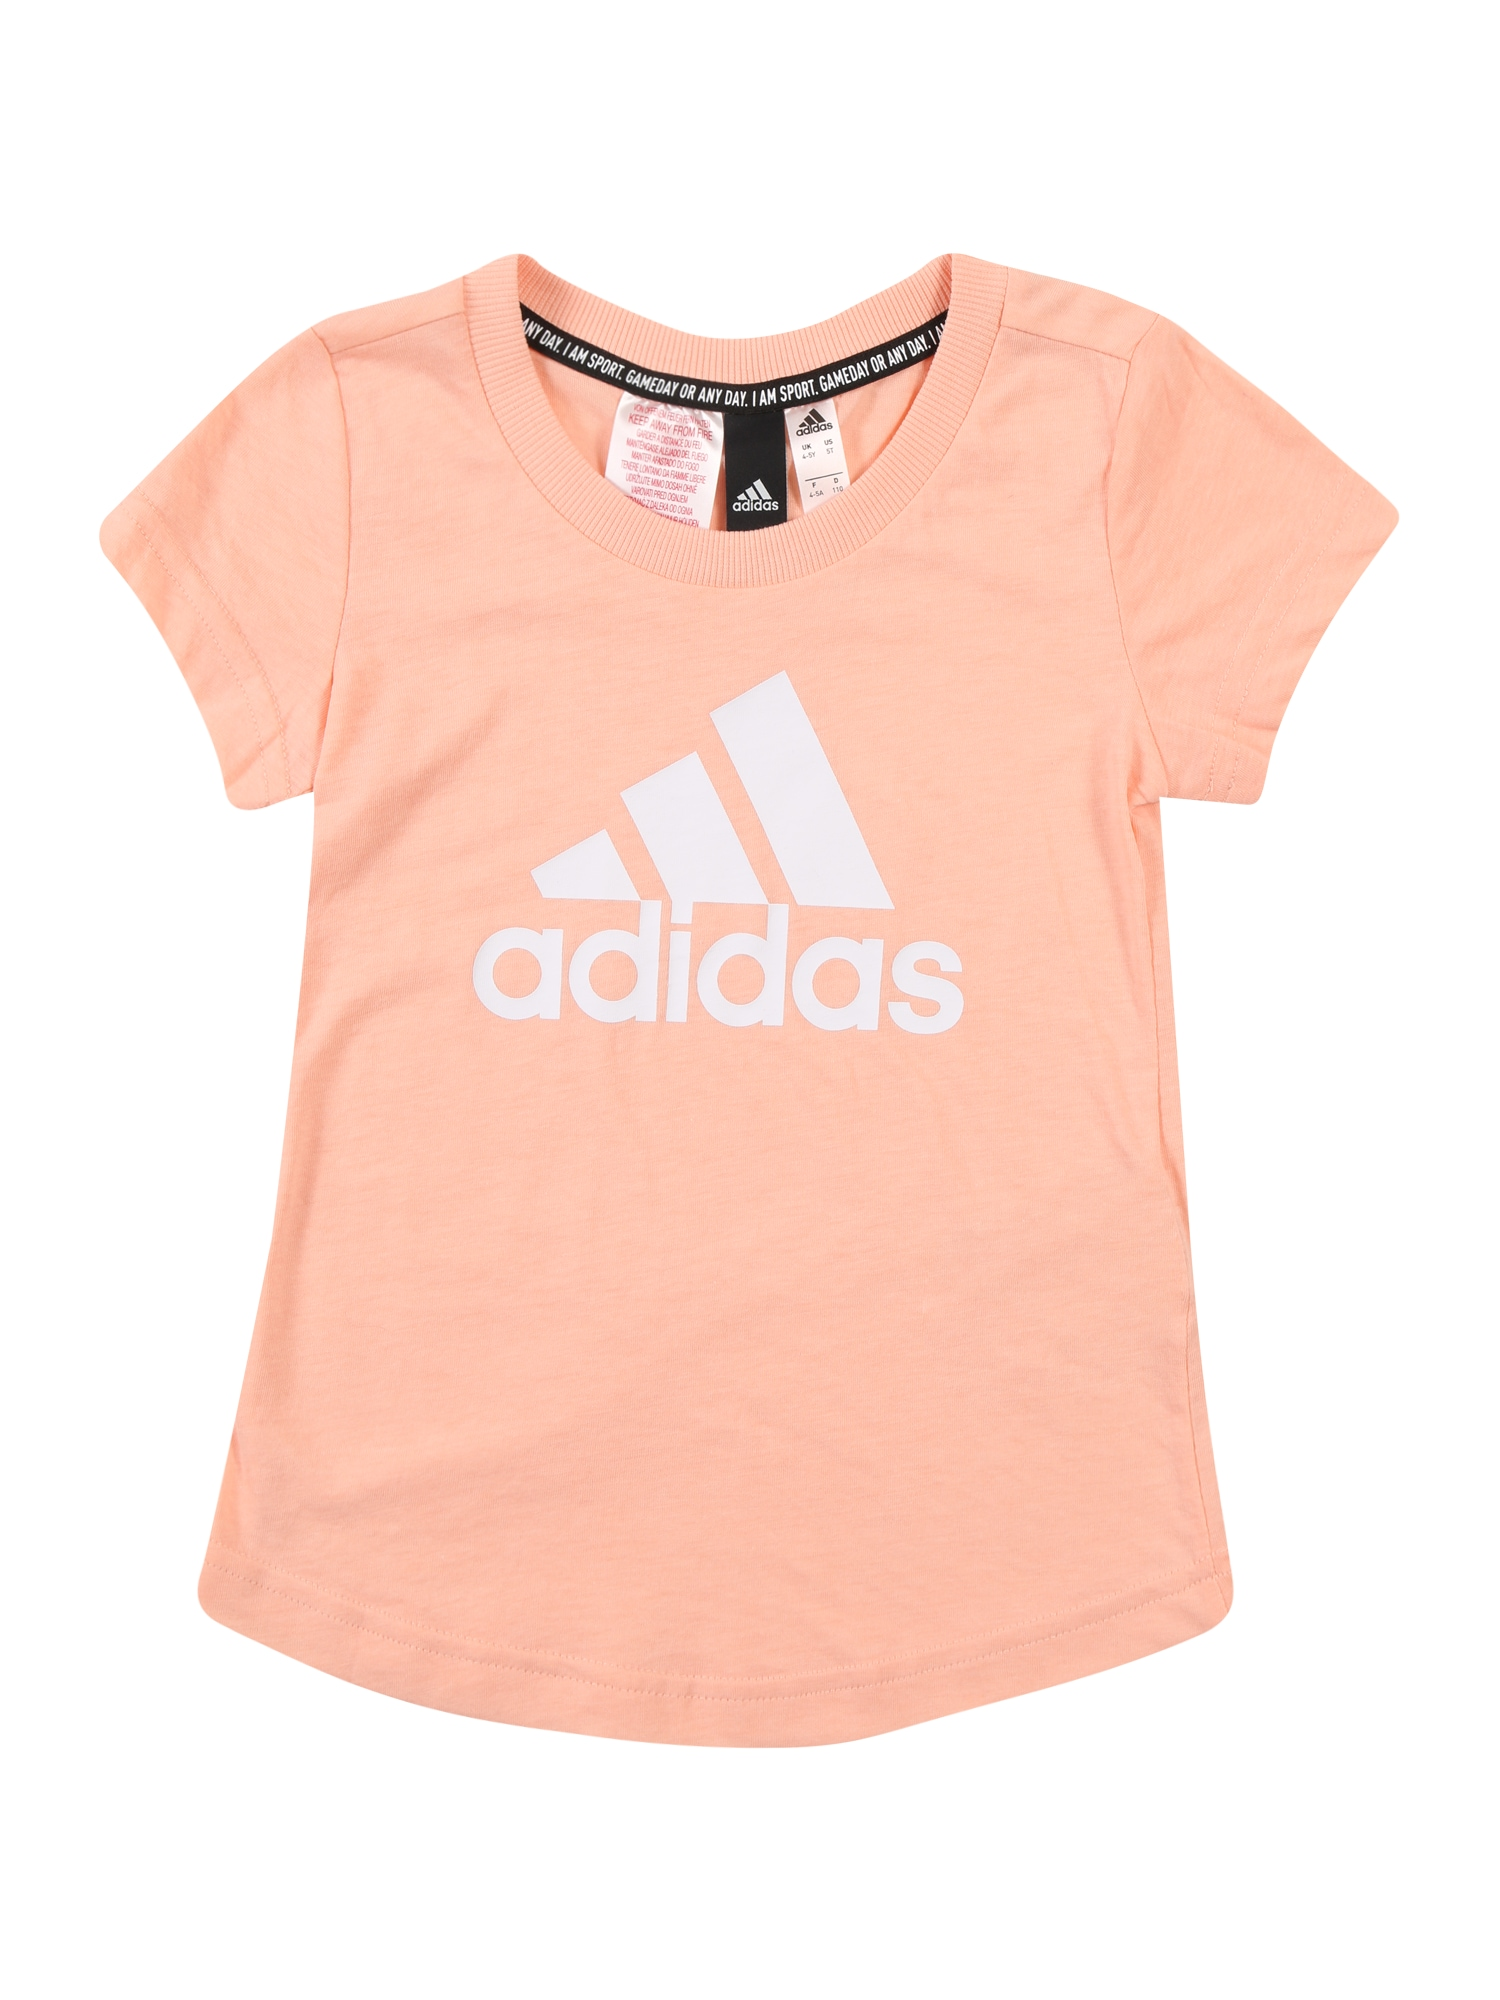 ADIDAS PERFORMANCE Funkčné tričko 'Must Have Batch Of Sport'  biela / staroružová / marhuľová